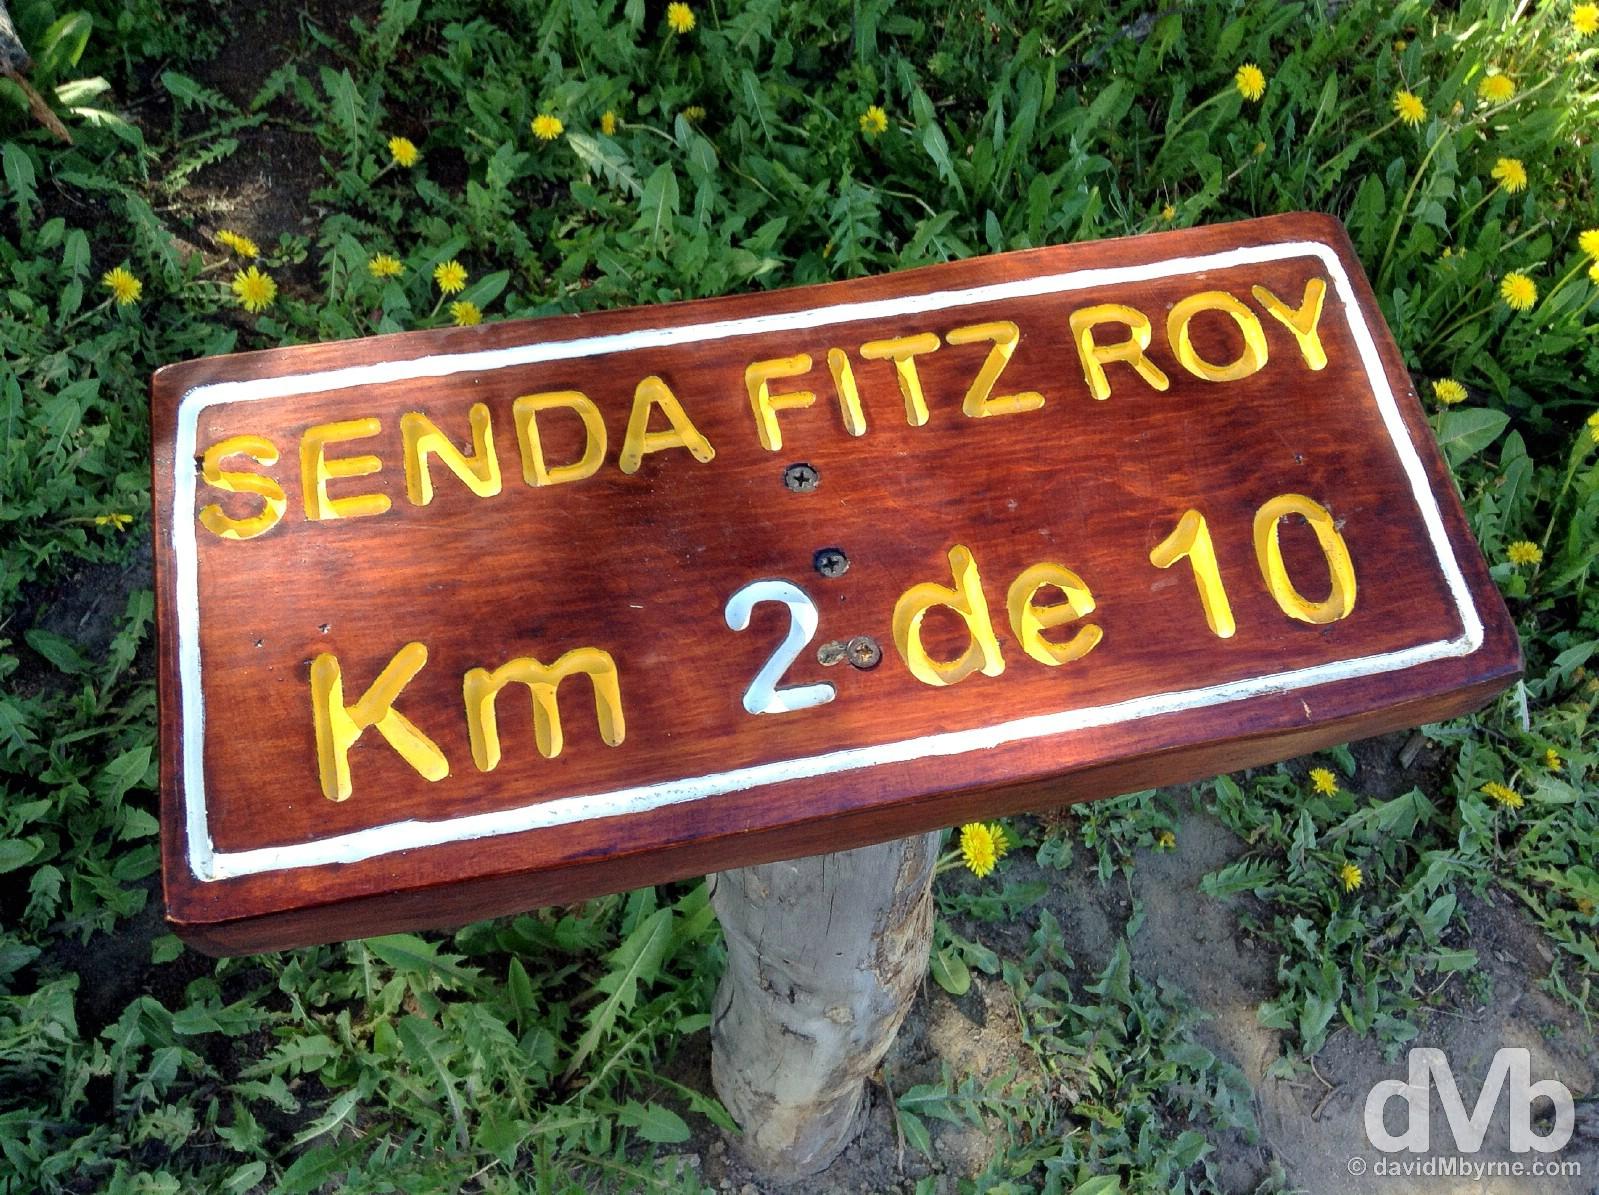 Kilometre markers on the Senda Fitz Roy (Fitz Roy Track) in the Fitz Roy sector of Parque Nacional Los Glaciares, southern Patagonia, Argentina. November 4, 2015.